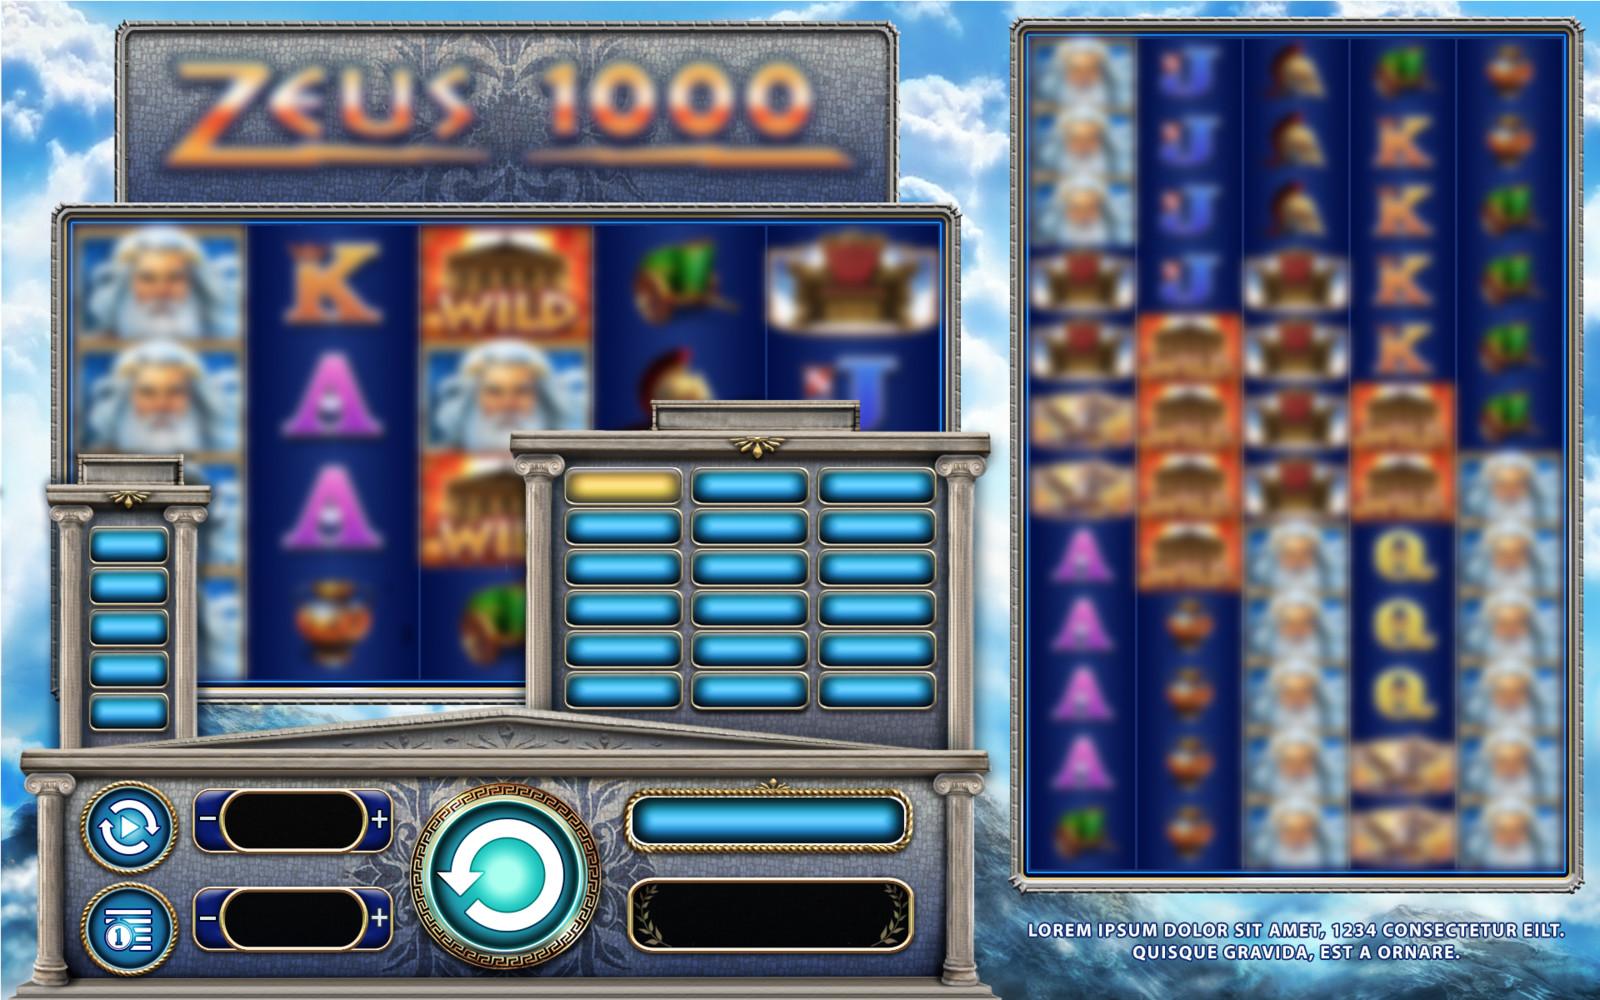 UI Art and Loadscreen for Zeus 1000